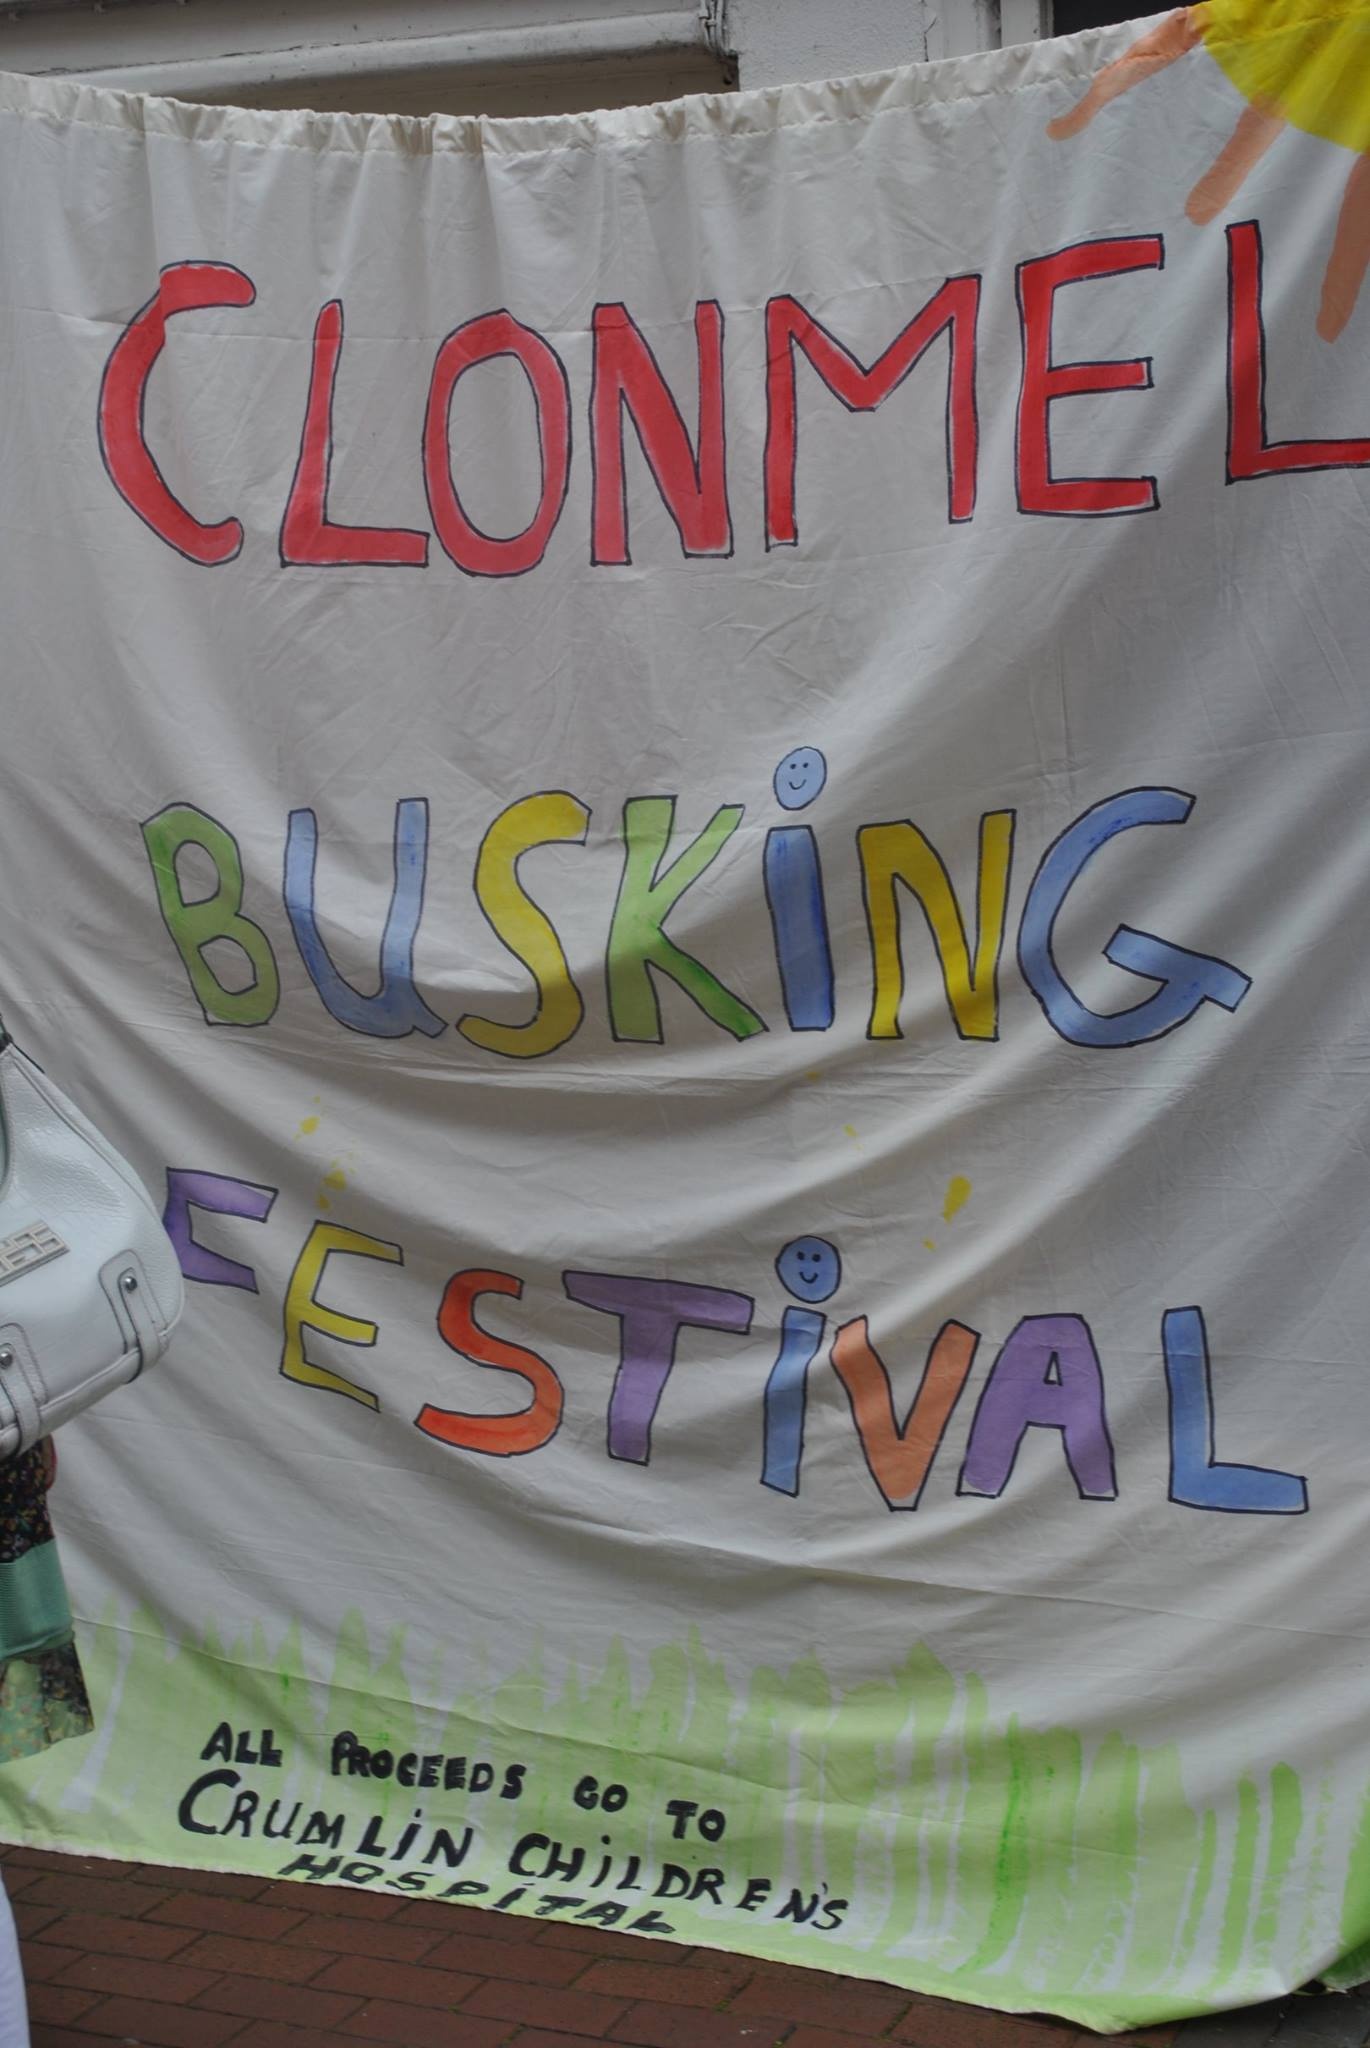 Clonmel Busking Festival | Photo 01